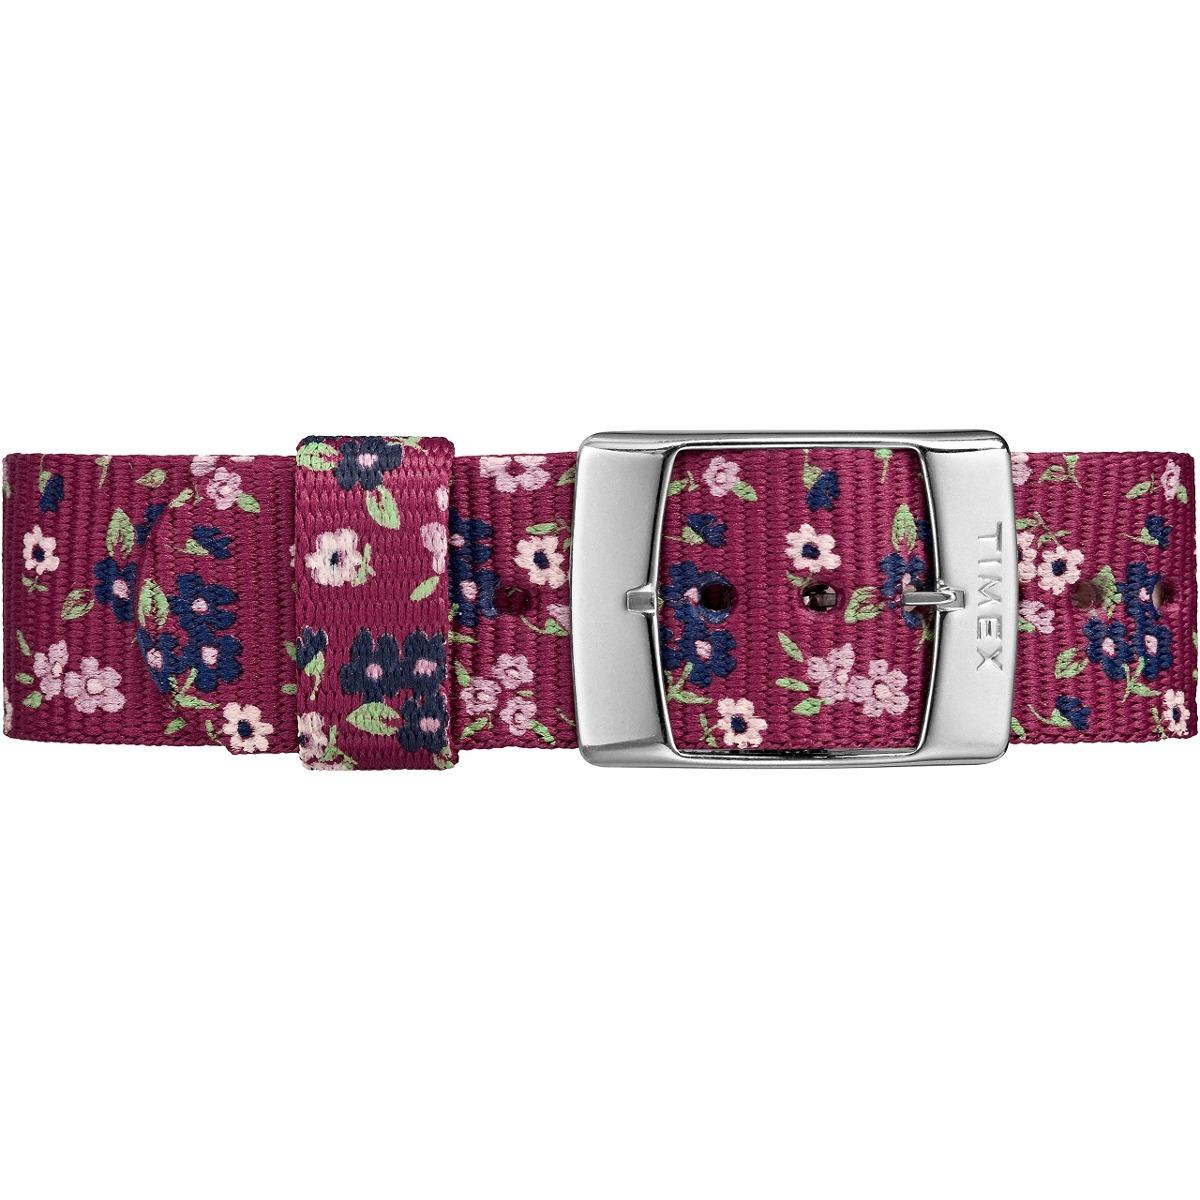 cc29c83b3bf2 Cargando zoom... reloj de mujer timex tw2r29700 weekender violet floral re